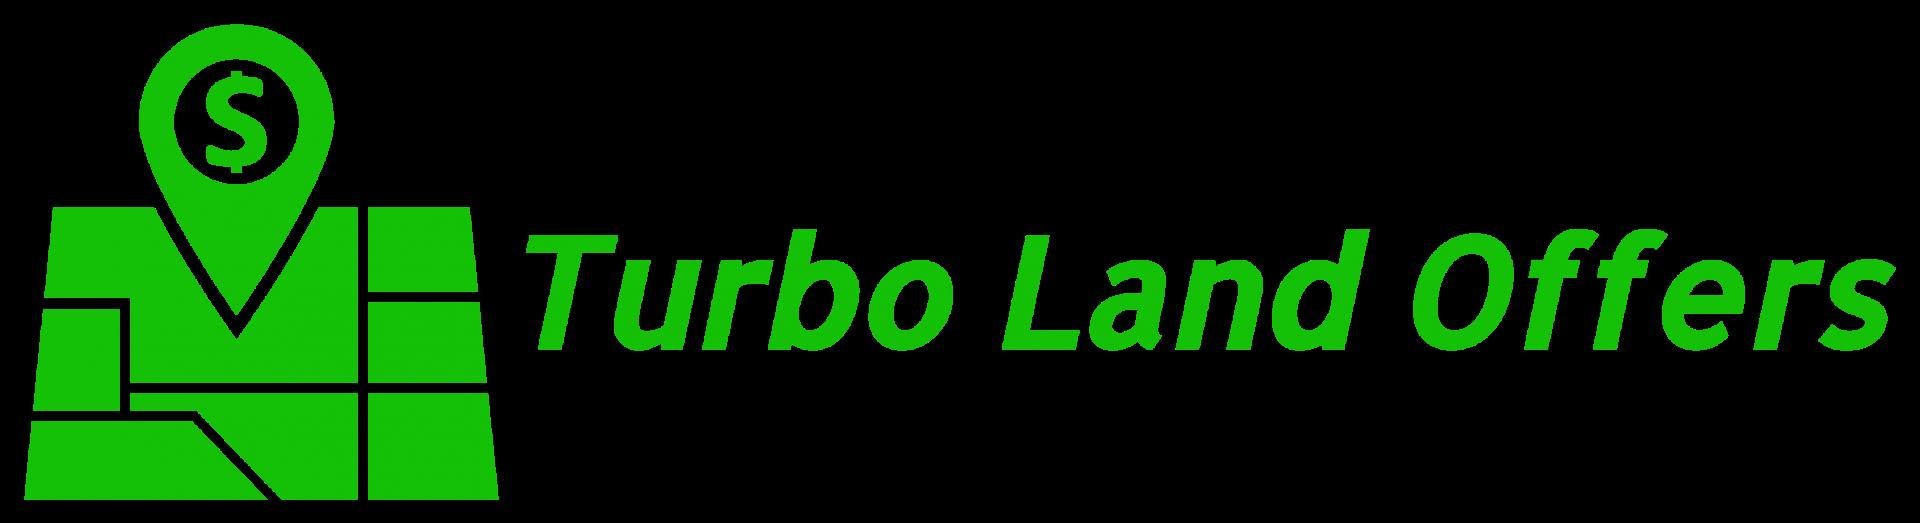 Turbo Land Offers logo